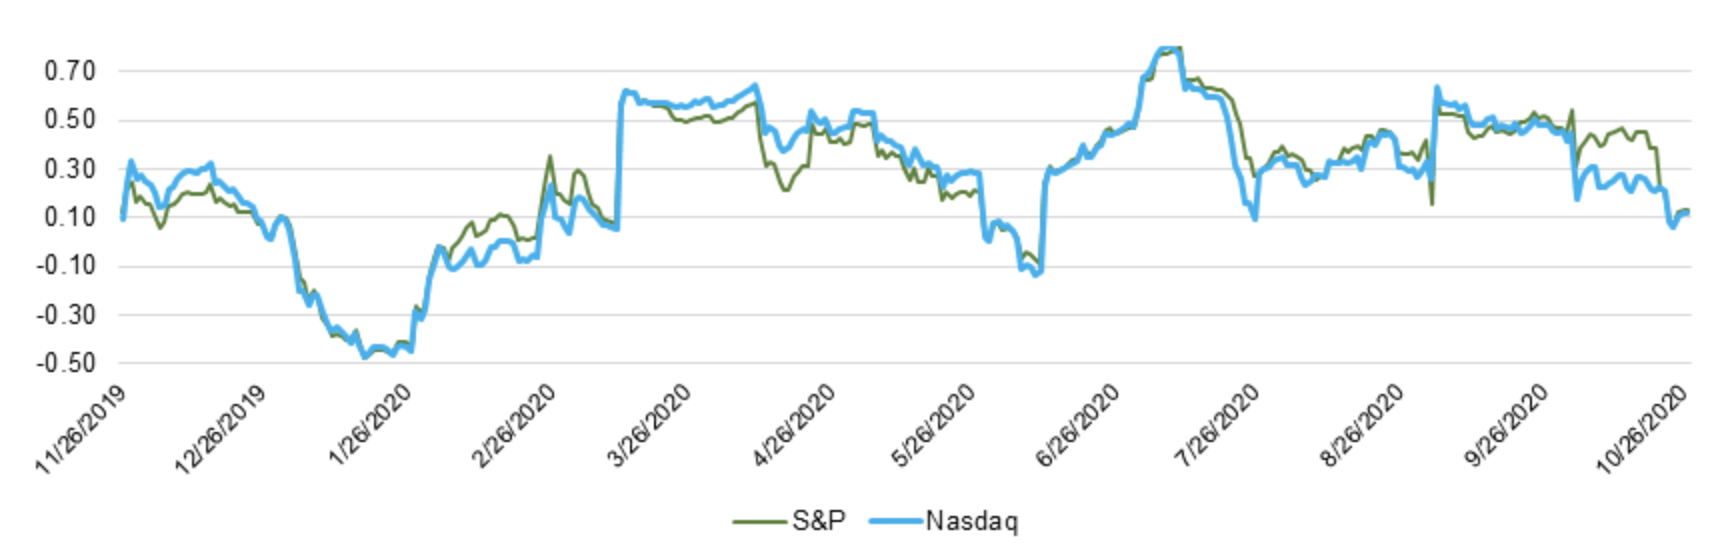 Bitcoin Correlation with US Equities